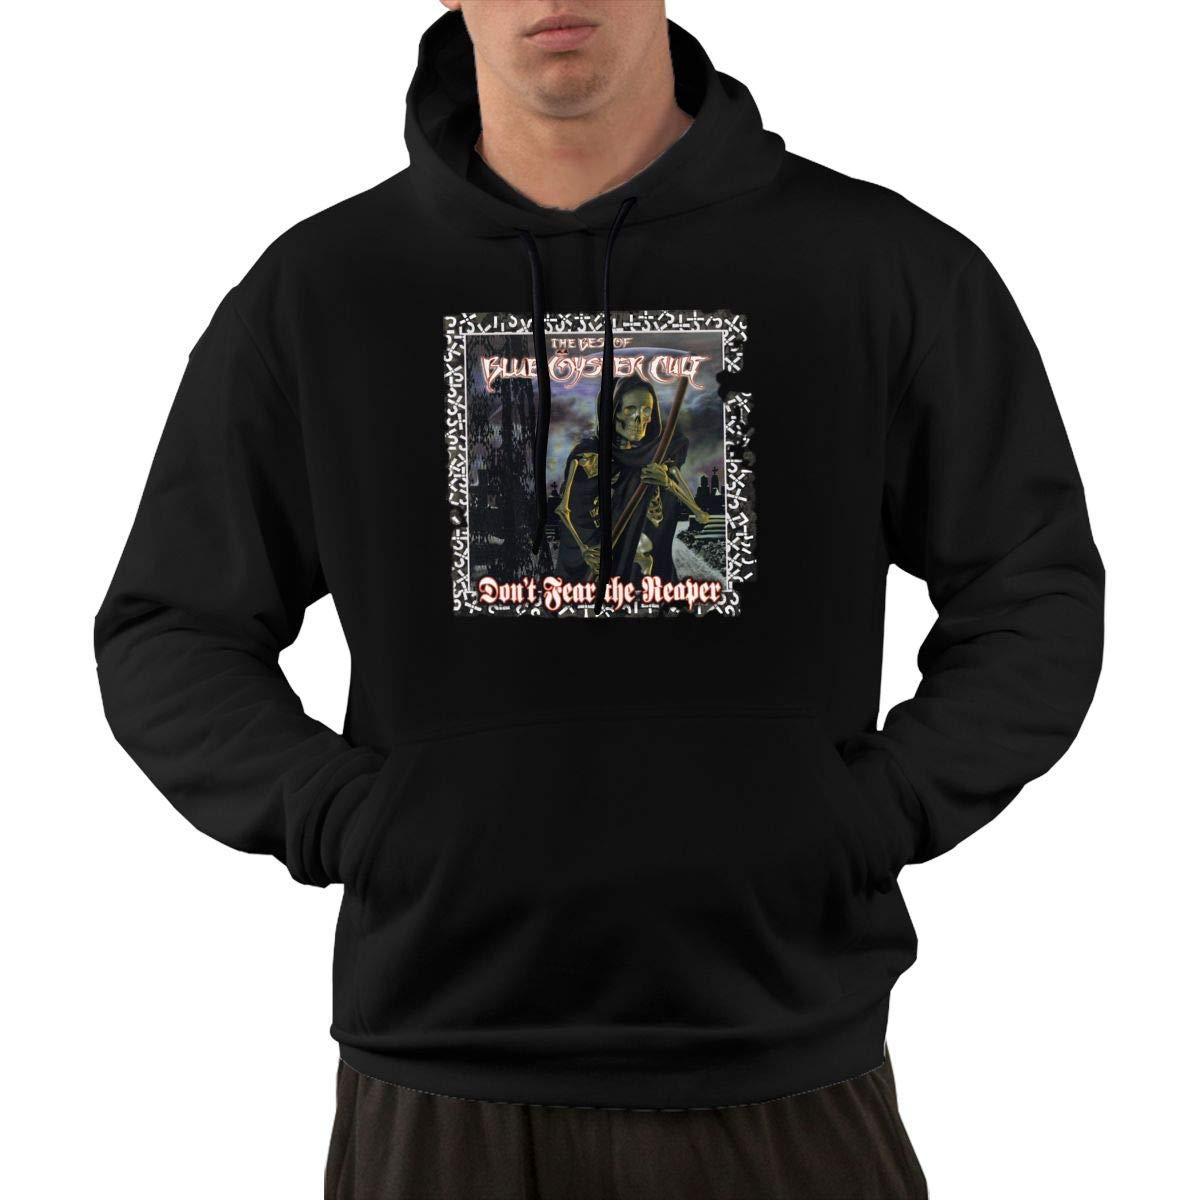 AlbertV Mens Blue Oyster Cult Dont Fear The Reaper Hoodies Hooded Sweatshirt Pocket Black